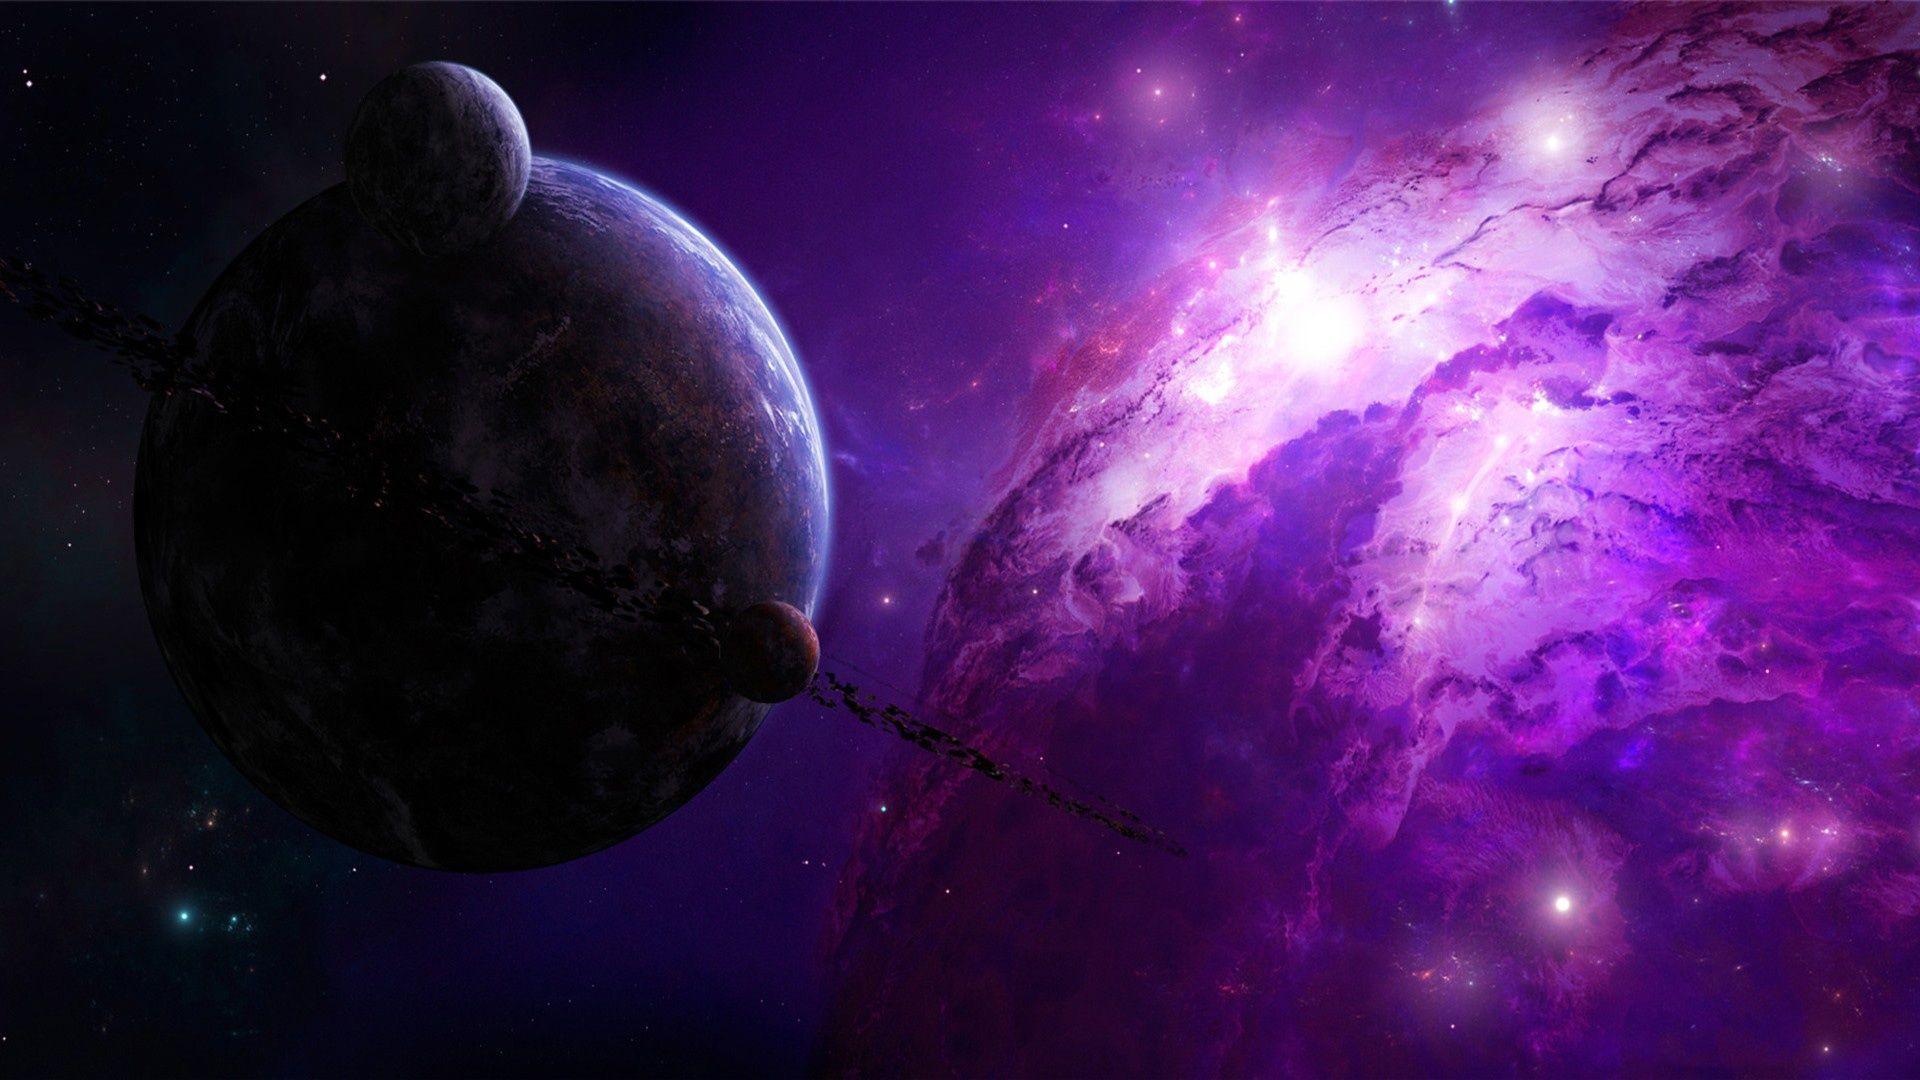 Galaxy Wallpaper 1080p Wallpapersafari Galaxy Wallpaper Hd Galaxy Wallpaper Purple Galaxy Wallpaper